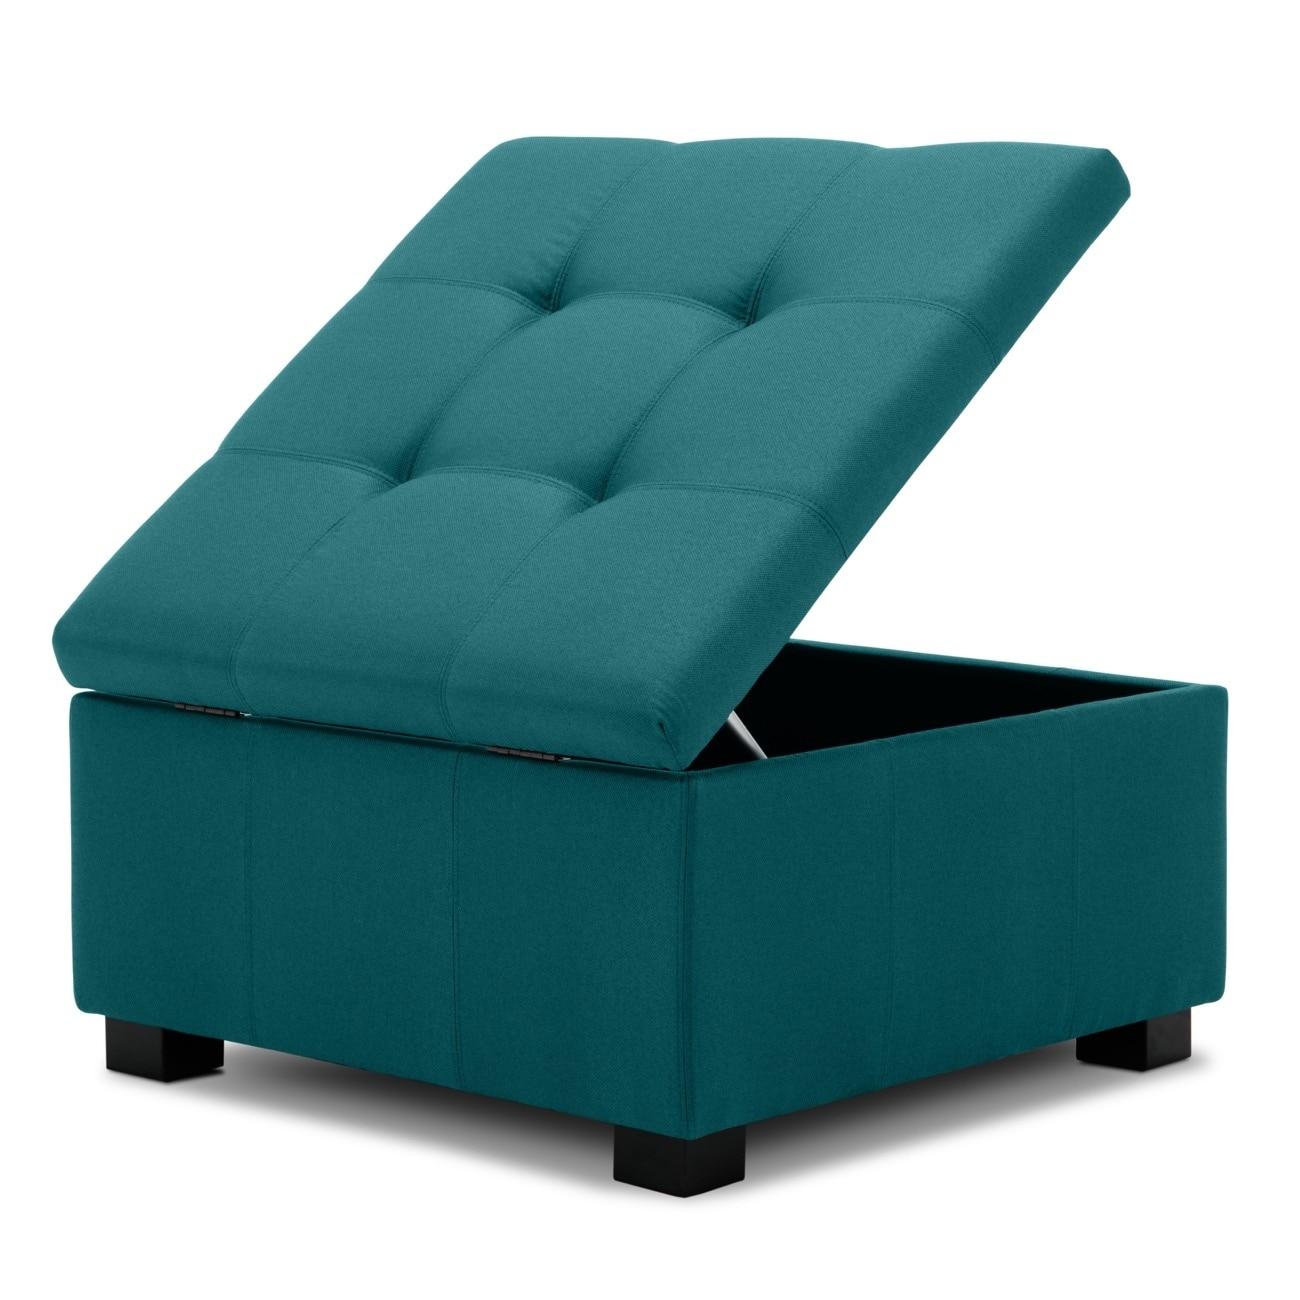 Belleze Upholstered Modern Style Living Room Bedroom Storage Ottoman Foot Bench Blue